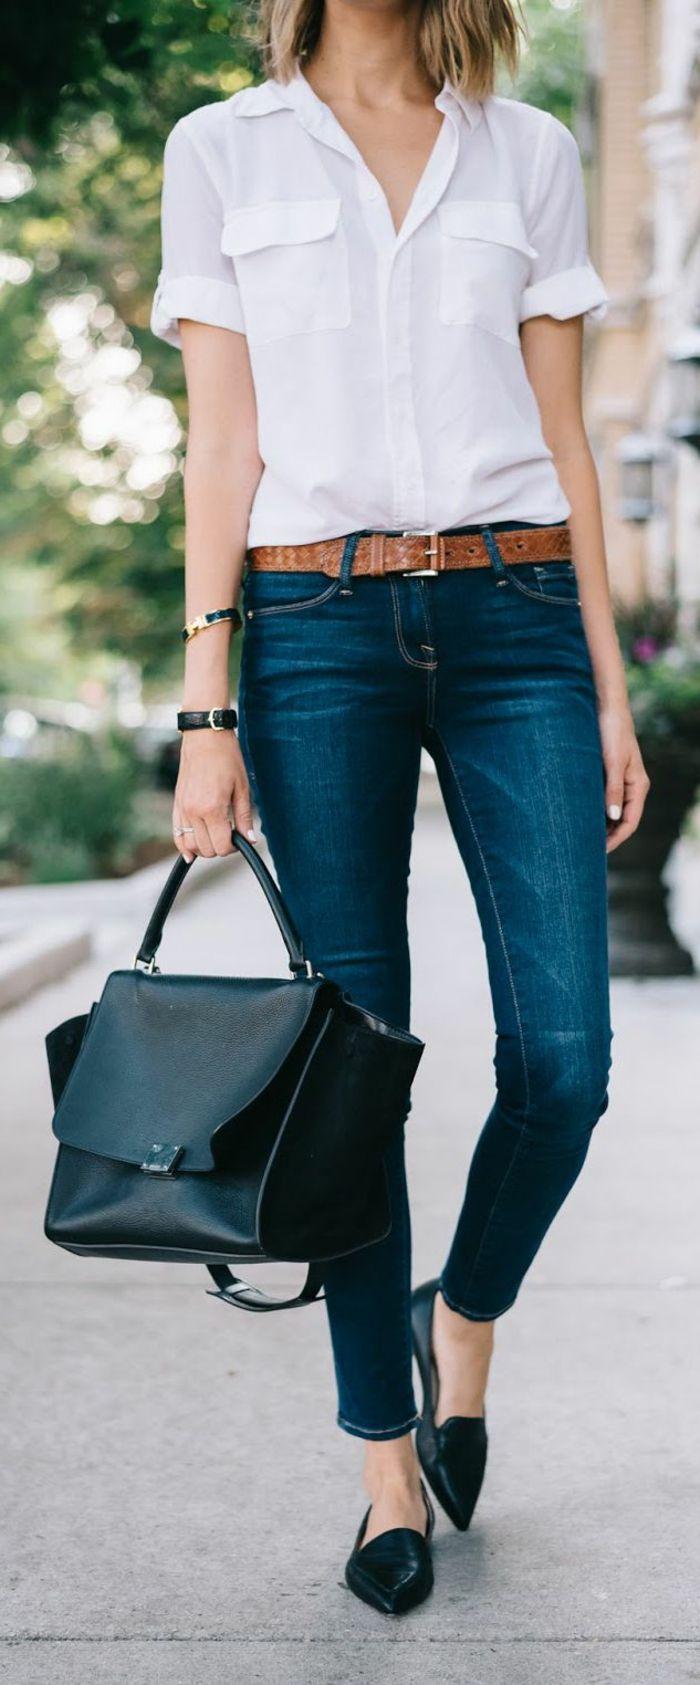 close up of a female torso, wearing white short-sleeved shirt, dark blue skinny jeans, black flats and brown belt, holding big black leather bag